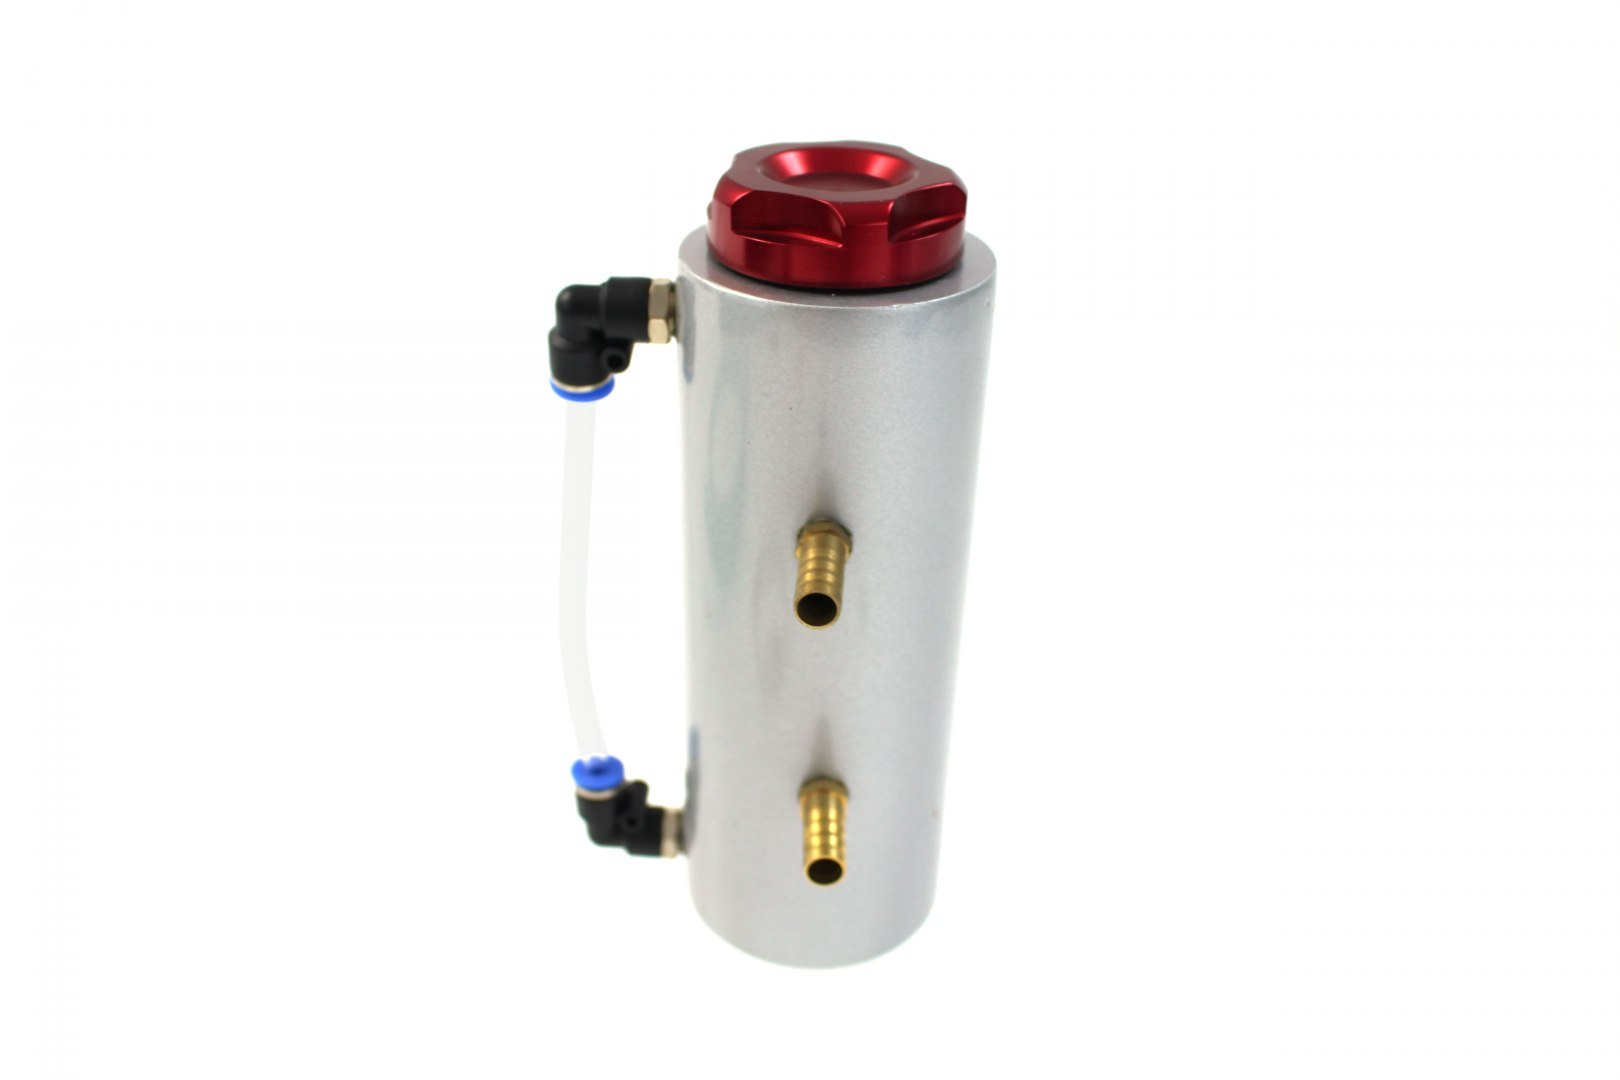 Oil catch tank 0.3L 9mm TurboWorks Silver - GRUBYGARAGE - Sklep Tuningowy